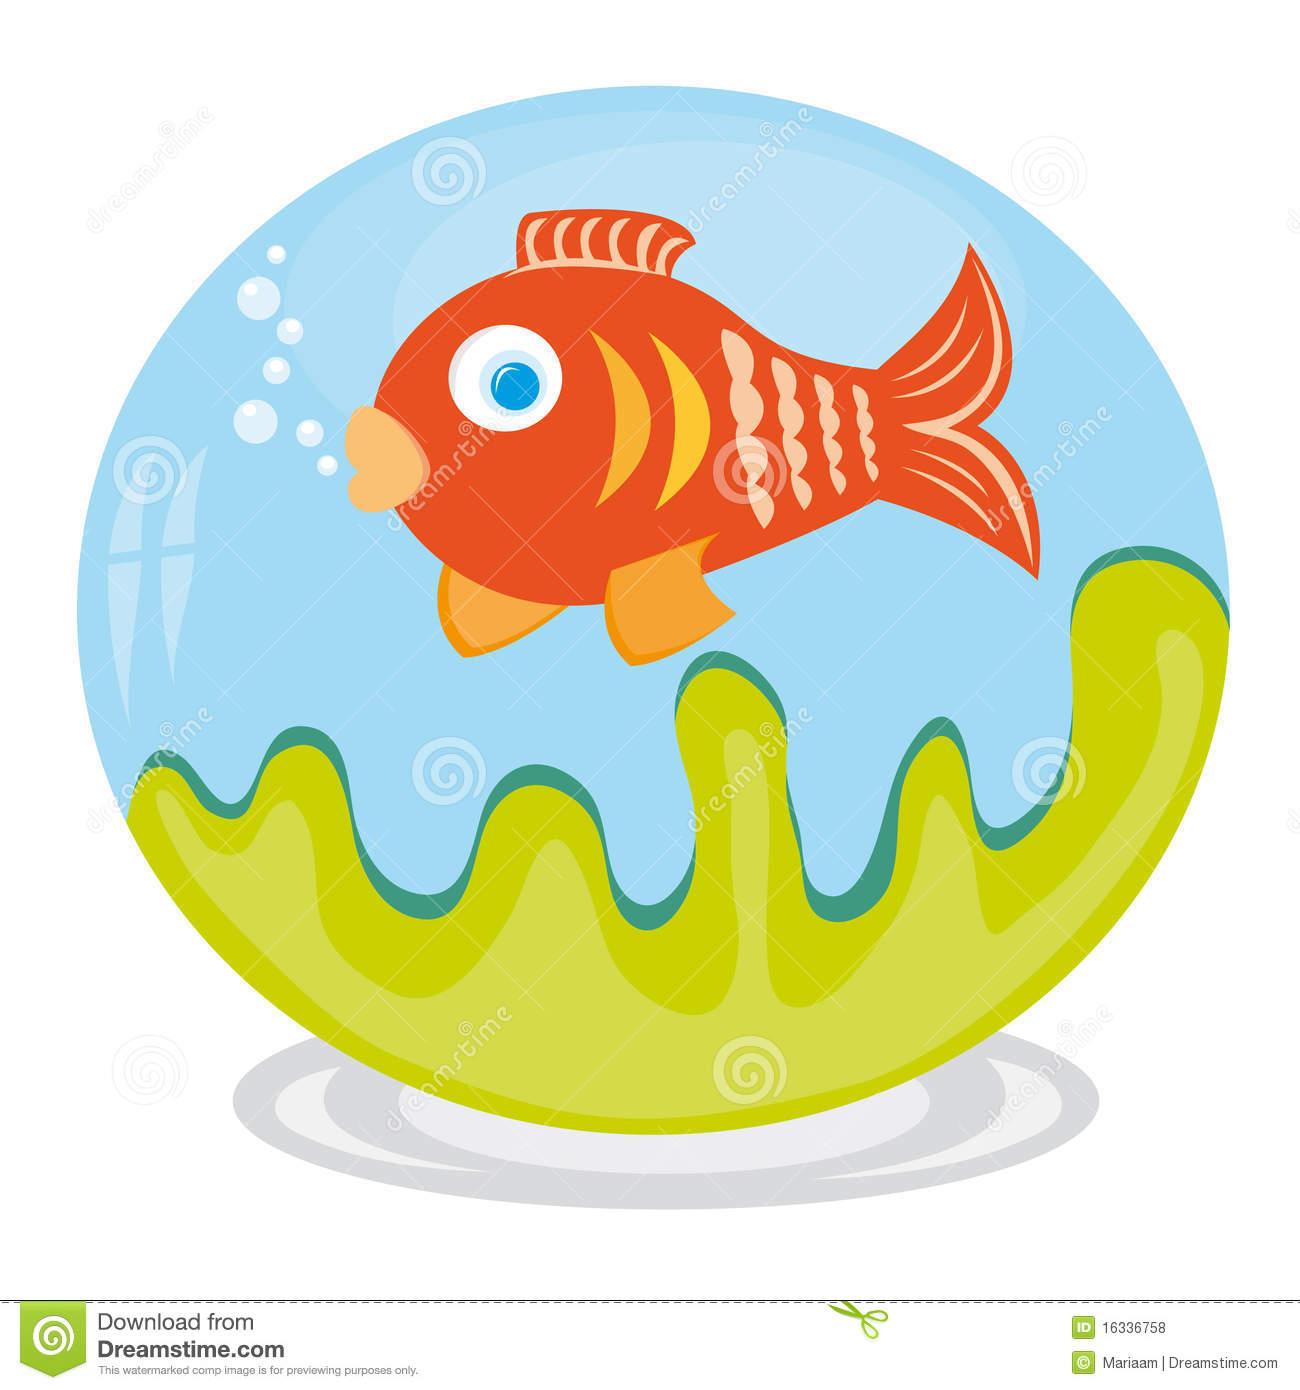 Clip Art Of Fish In Aquarium Royalty Free Stock Photos.